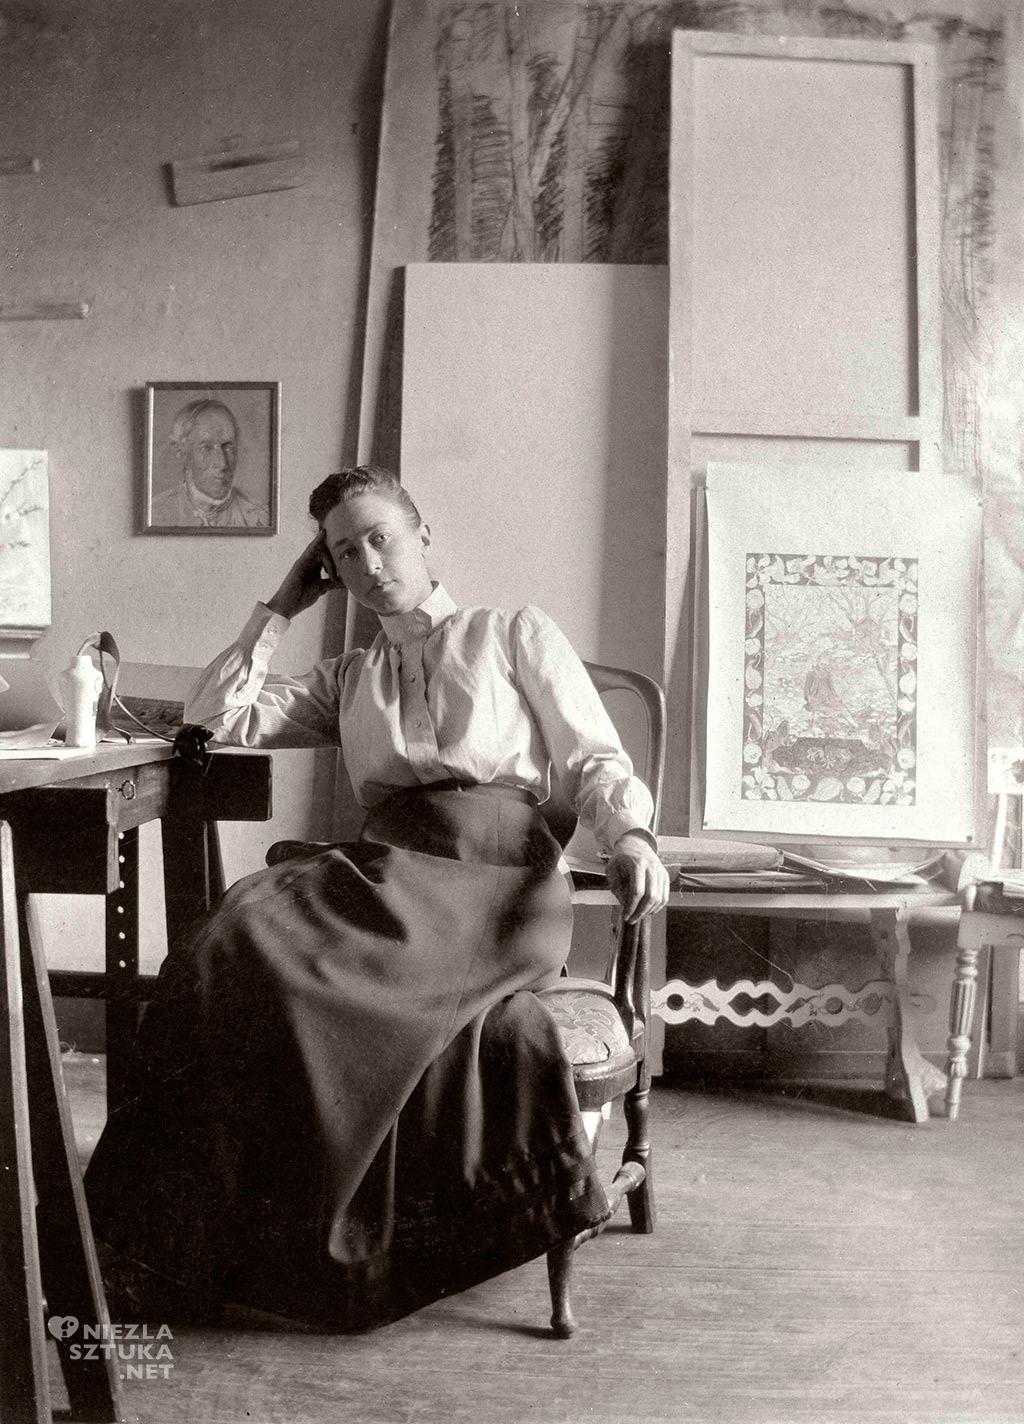 Hilma af Klint, malarstwo abstrakcyjne, Niezła sztuka